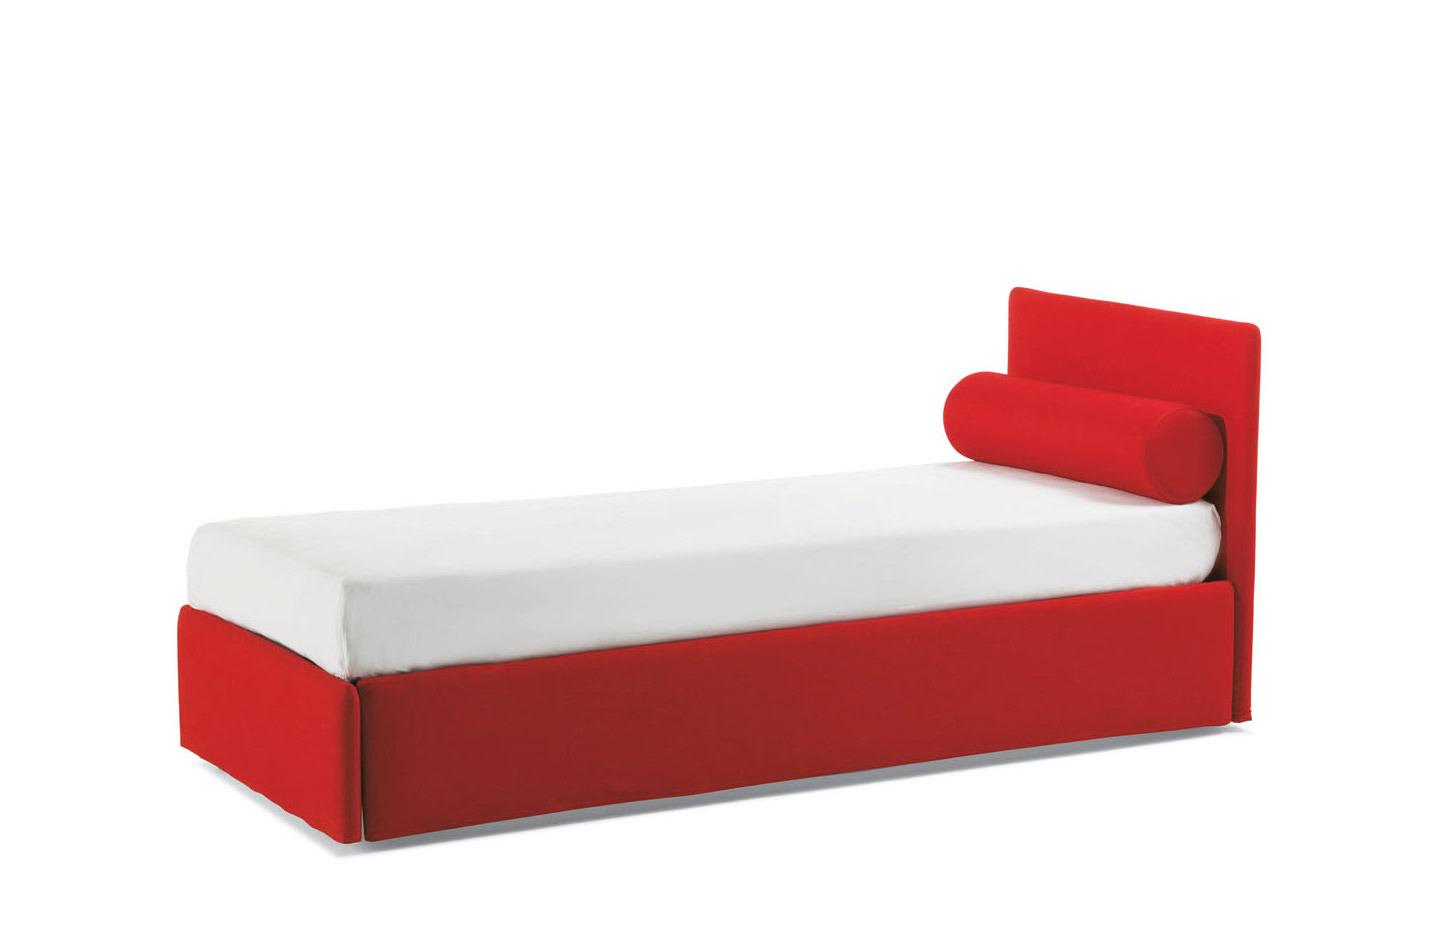 bontempi duplo bett betten. Black Bedroom Furniture Sets. Home Design Ideas